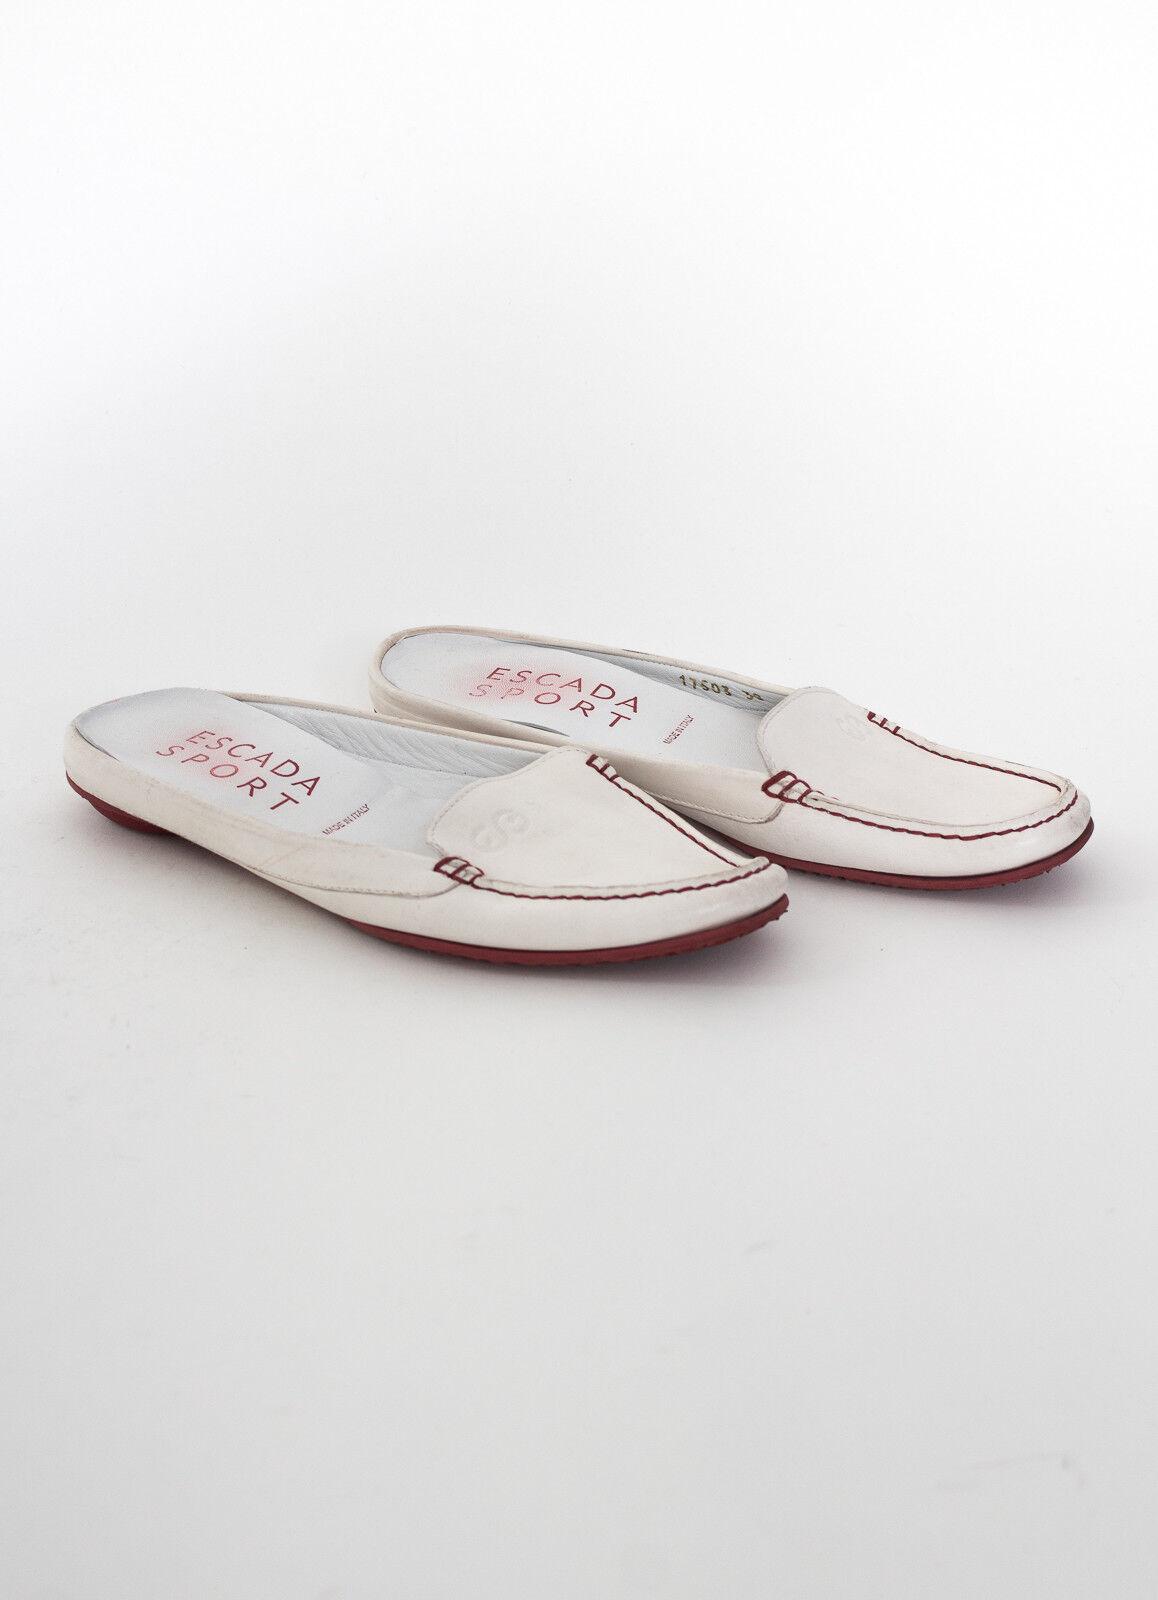 Escada Sport Sandali MIS. de 38 Scarpe pelle da donna in pelle Scarpe bianca fe449a